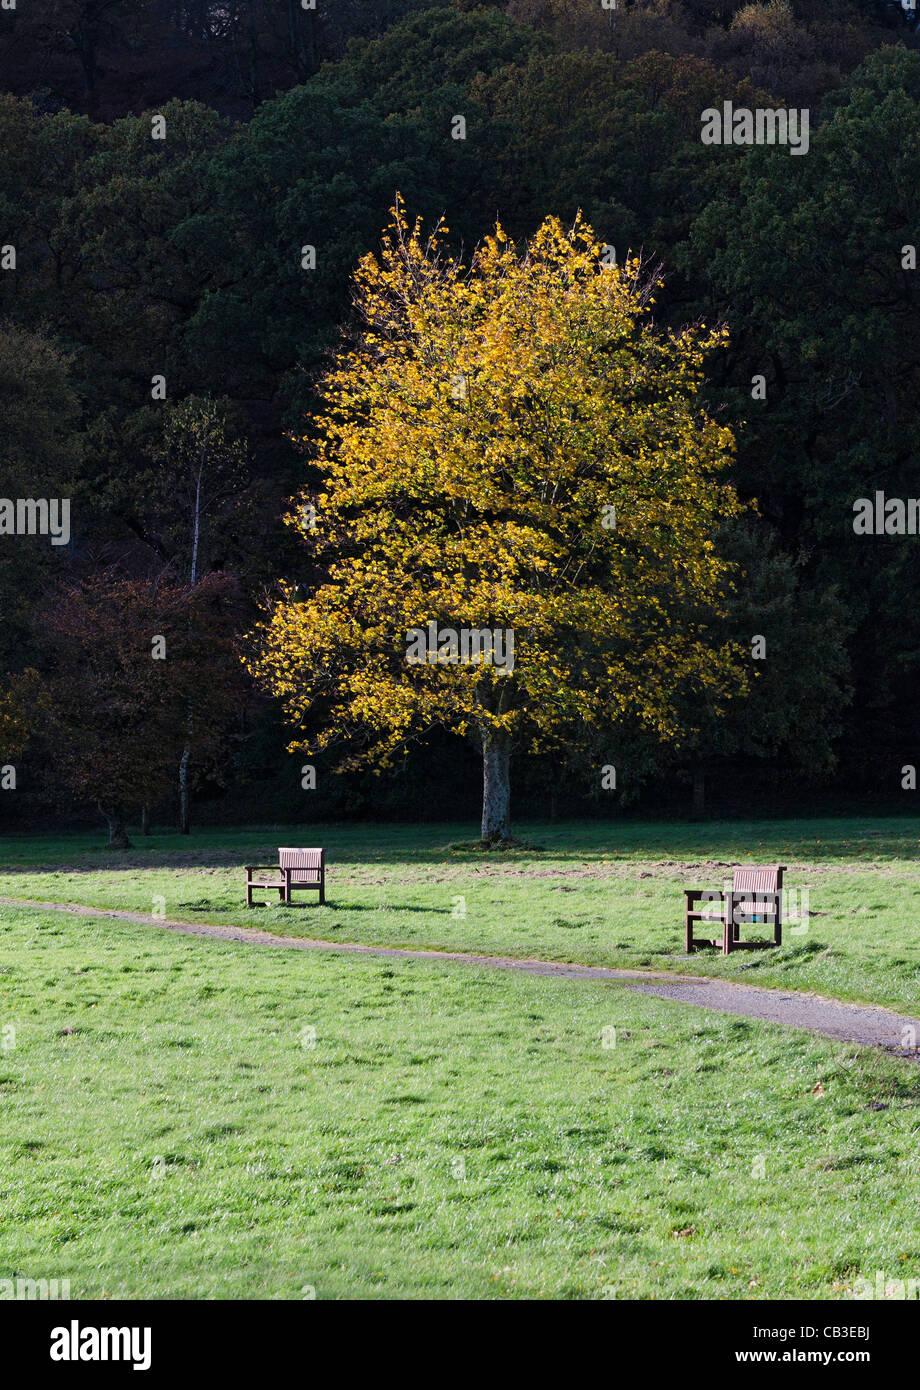 Park in autumn - Stock Image